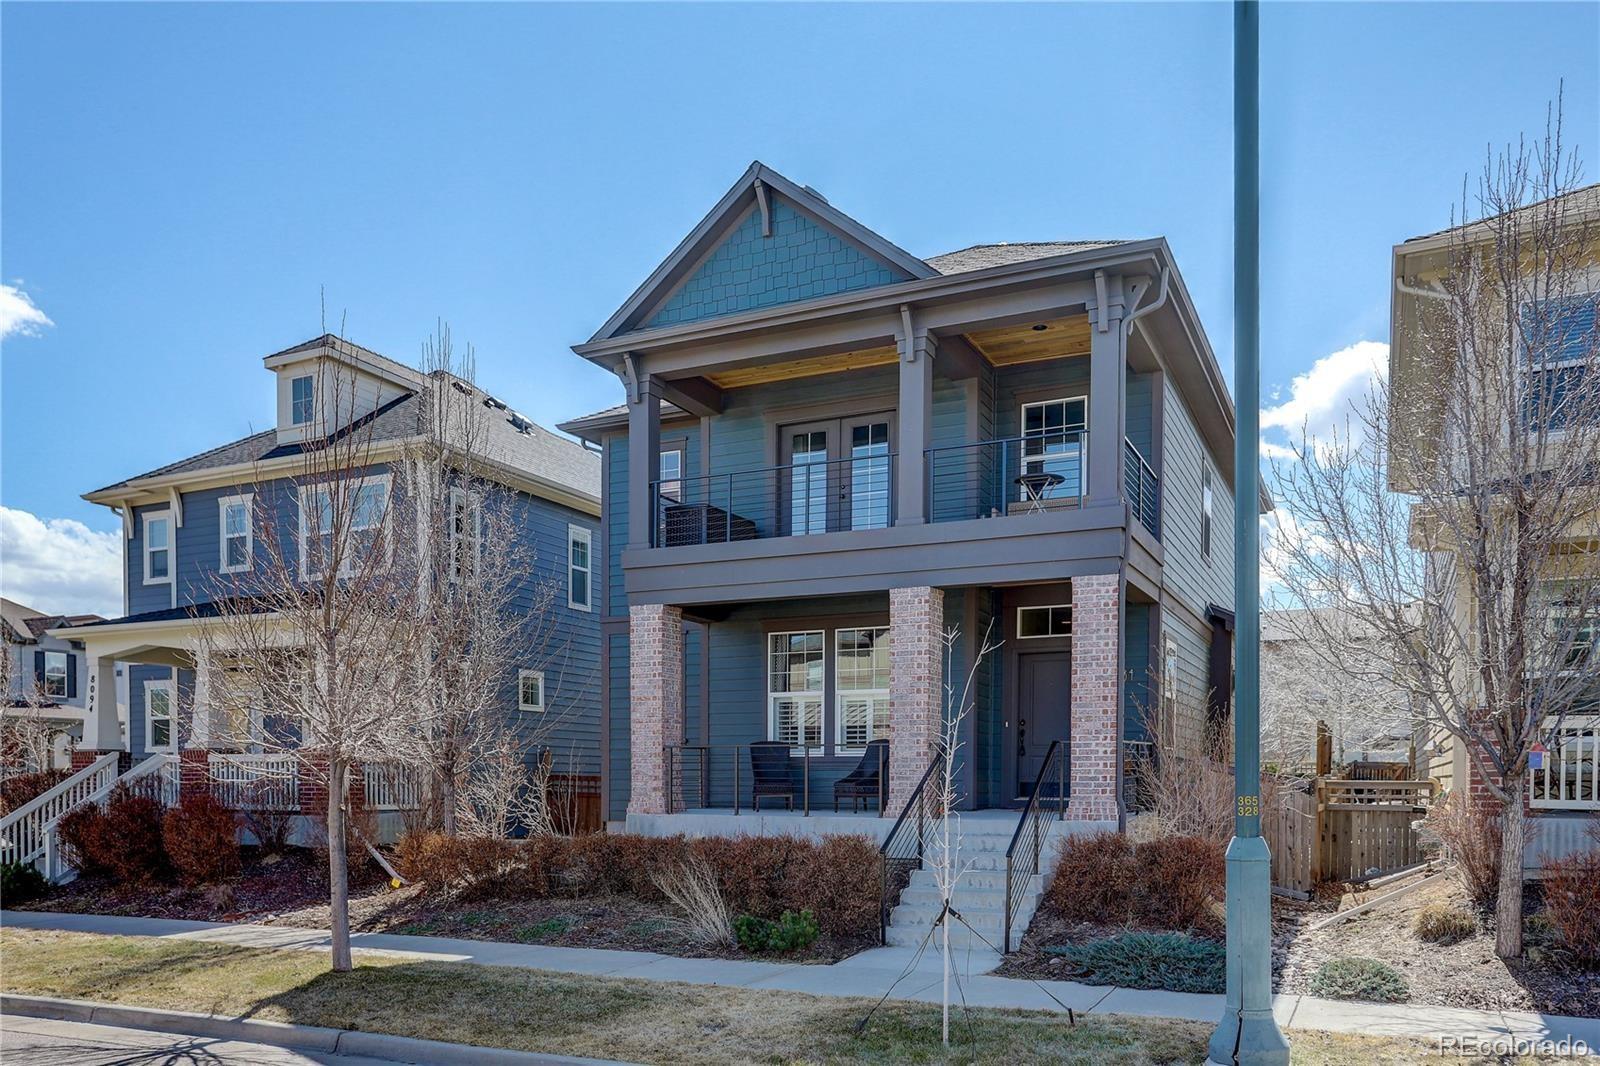 MLS# 6992885 - 39 - 8084 E 31st Avenue, Denver, CO 80238